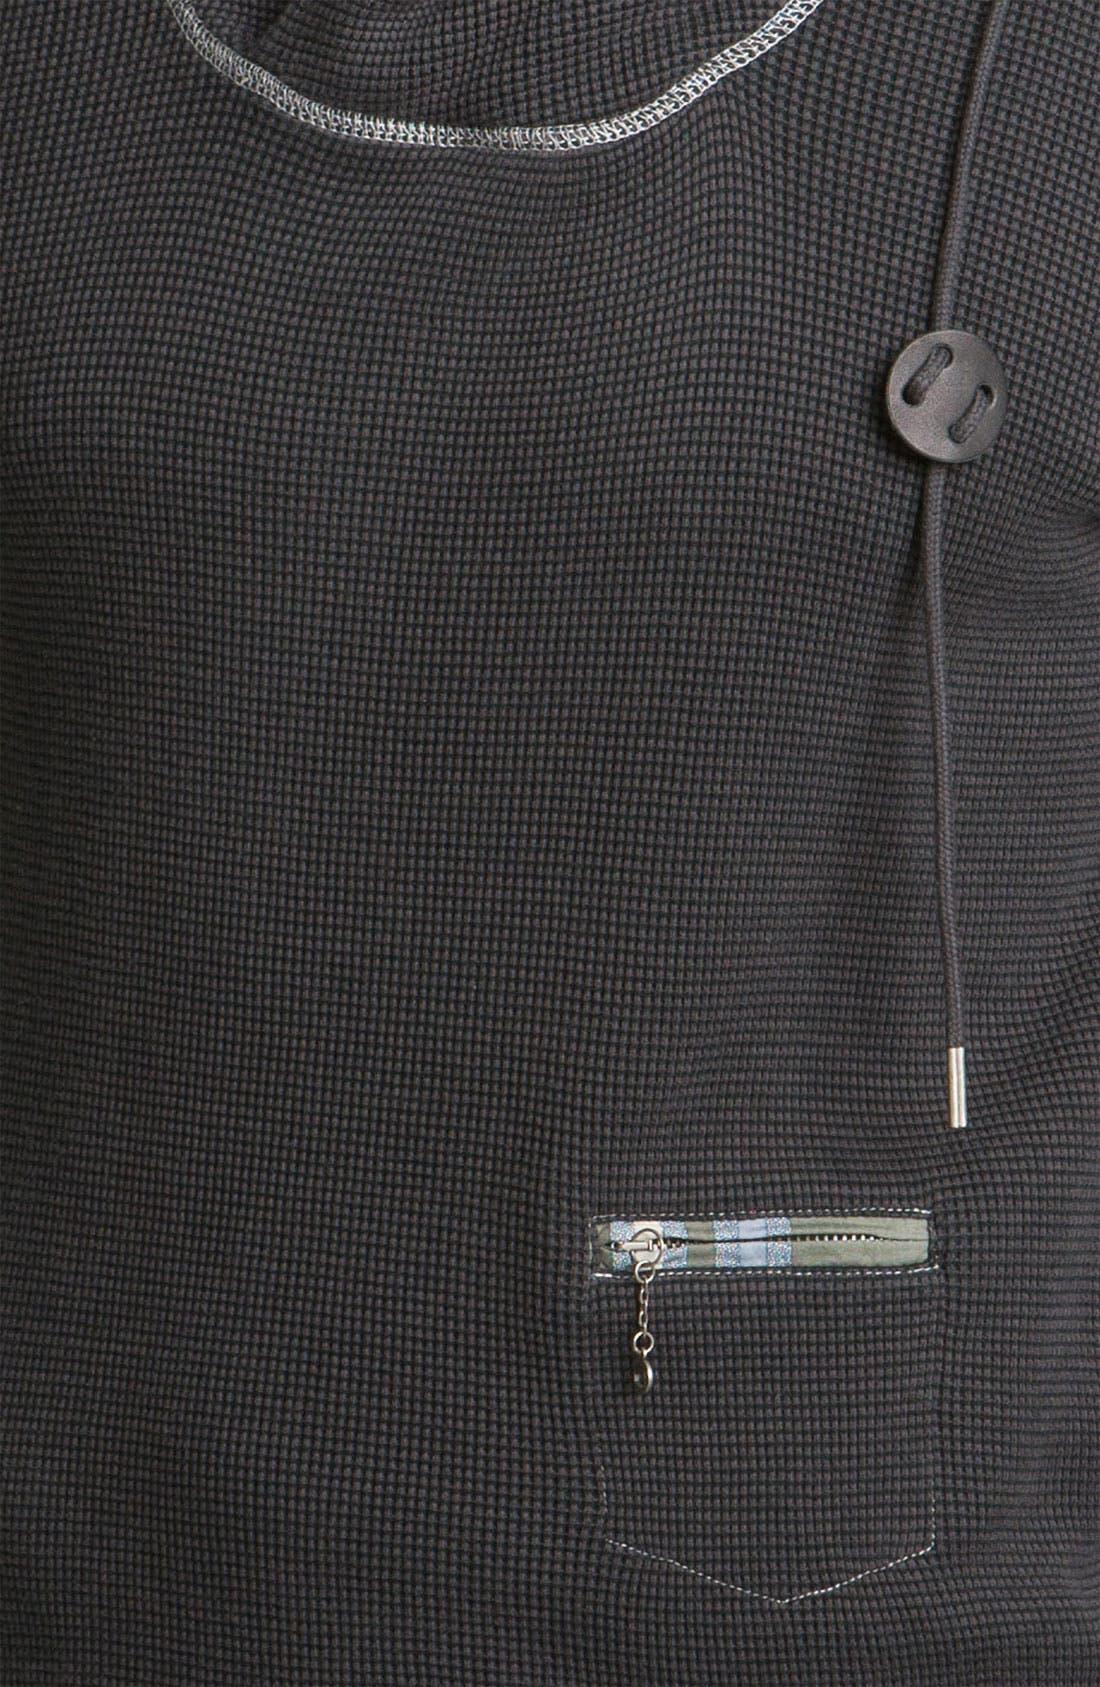 Alternate Image 3  - DIESEL® 'Sybill' Fleece Pullover Sweatshirt